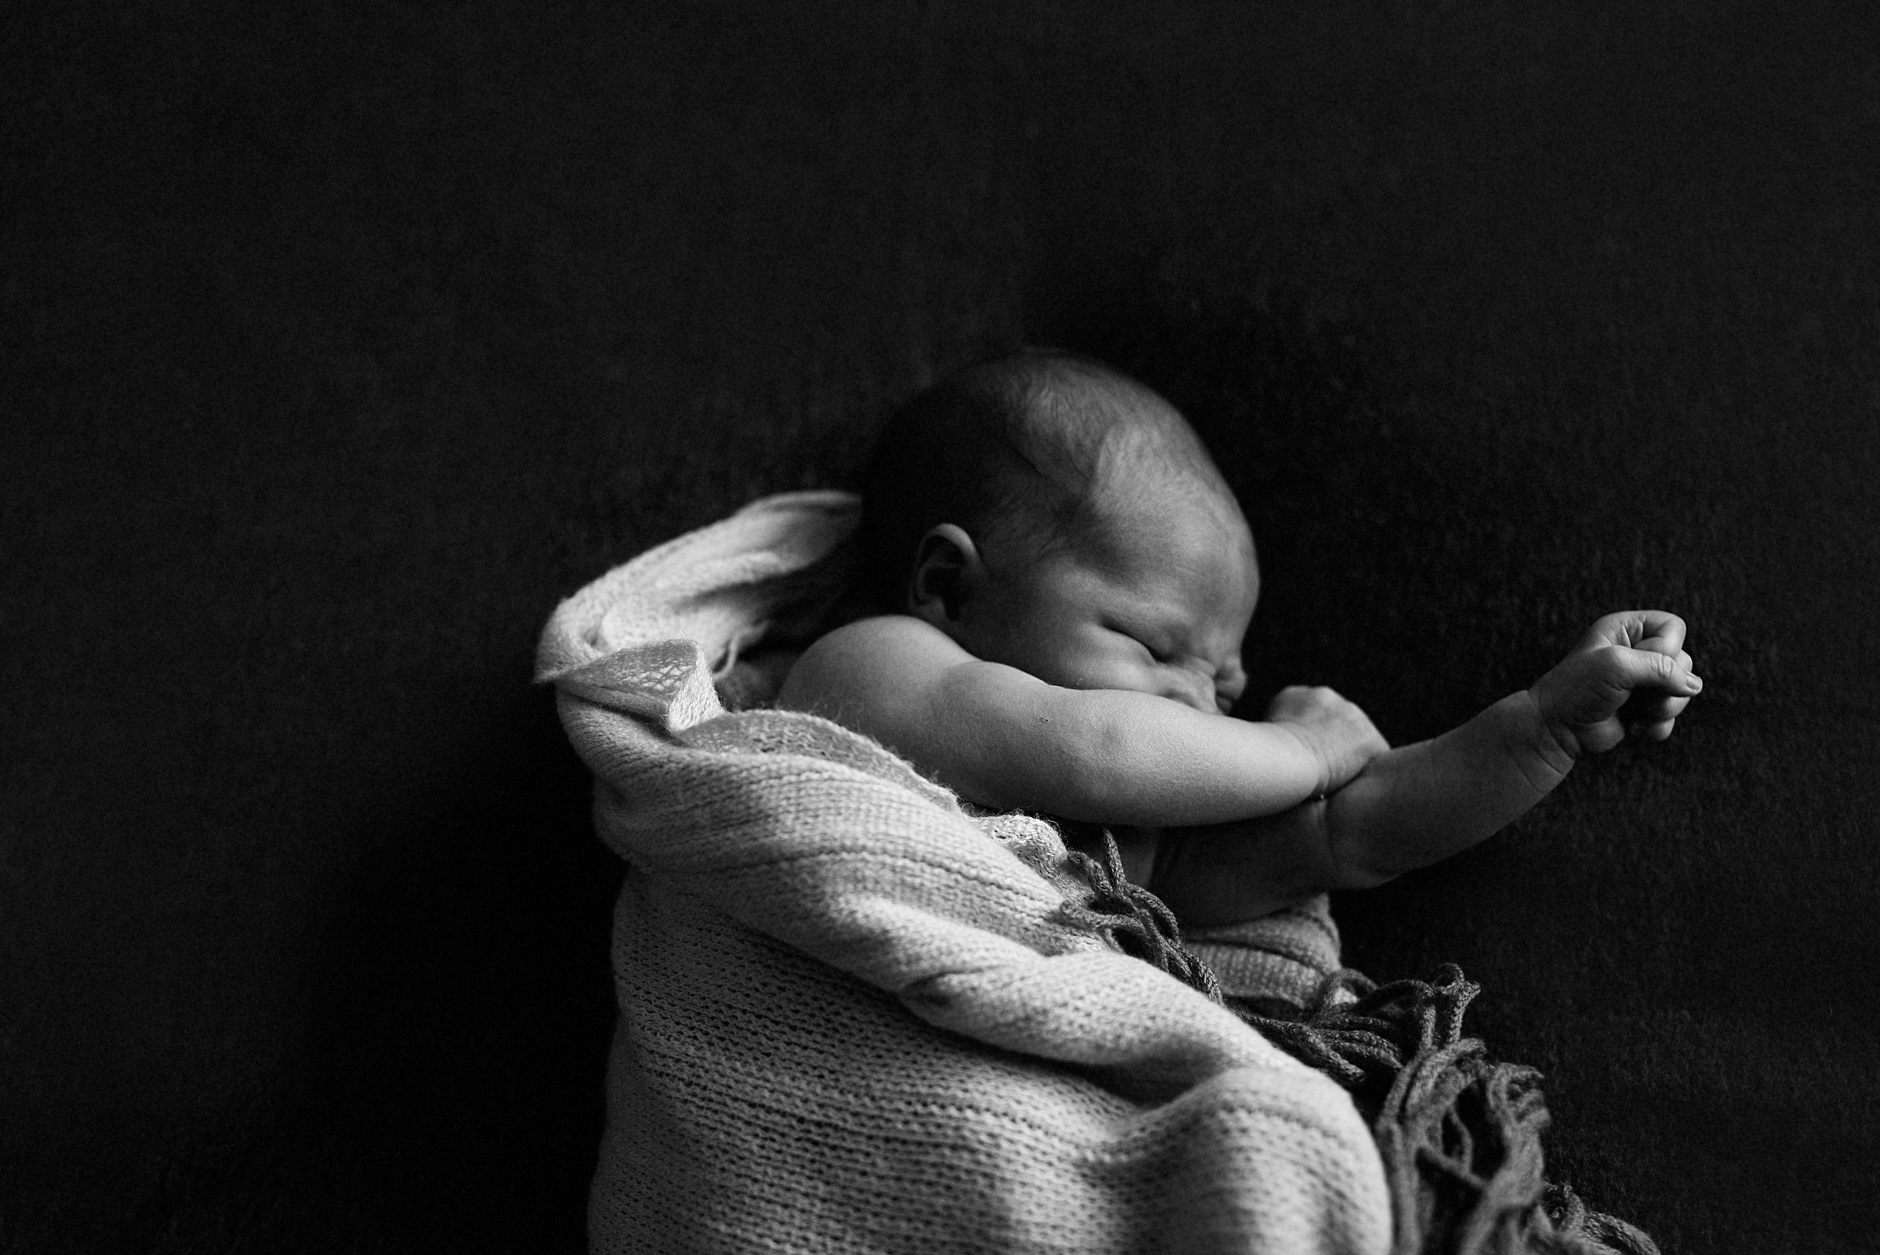 New_Born_Photographer_Glasgow_Nikki_Leadbetter_Photography-32.jpg